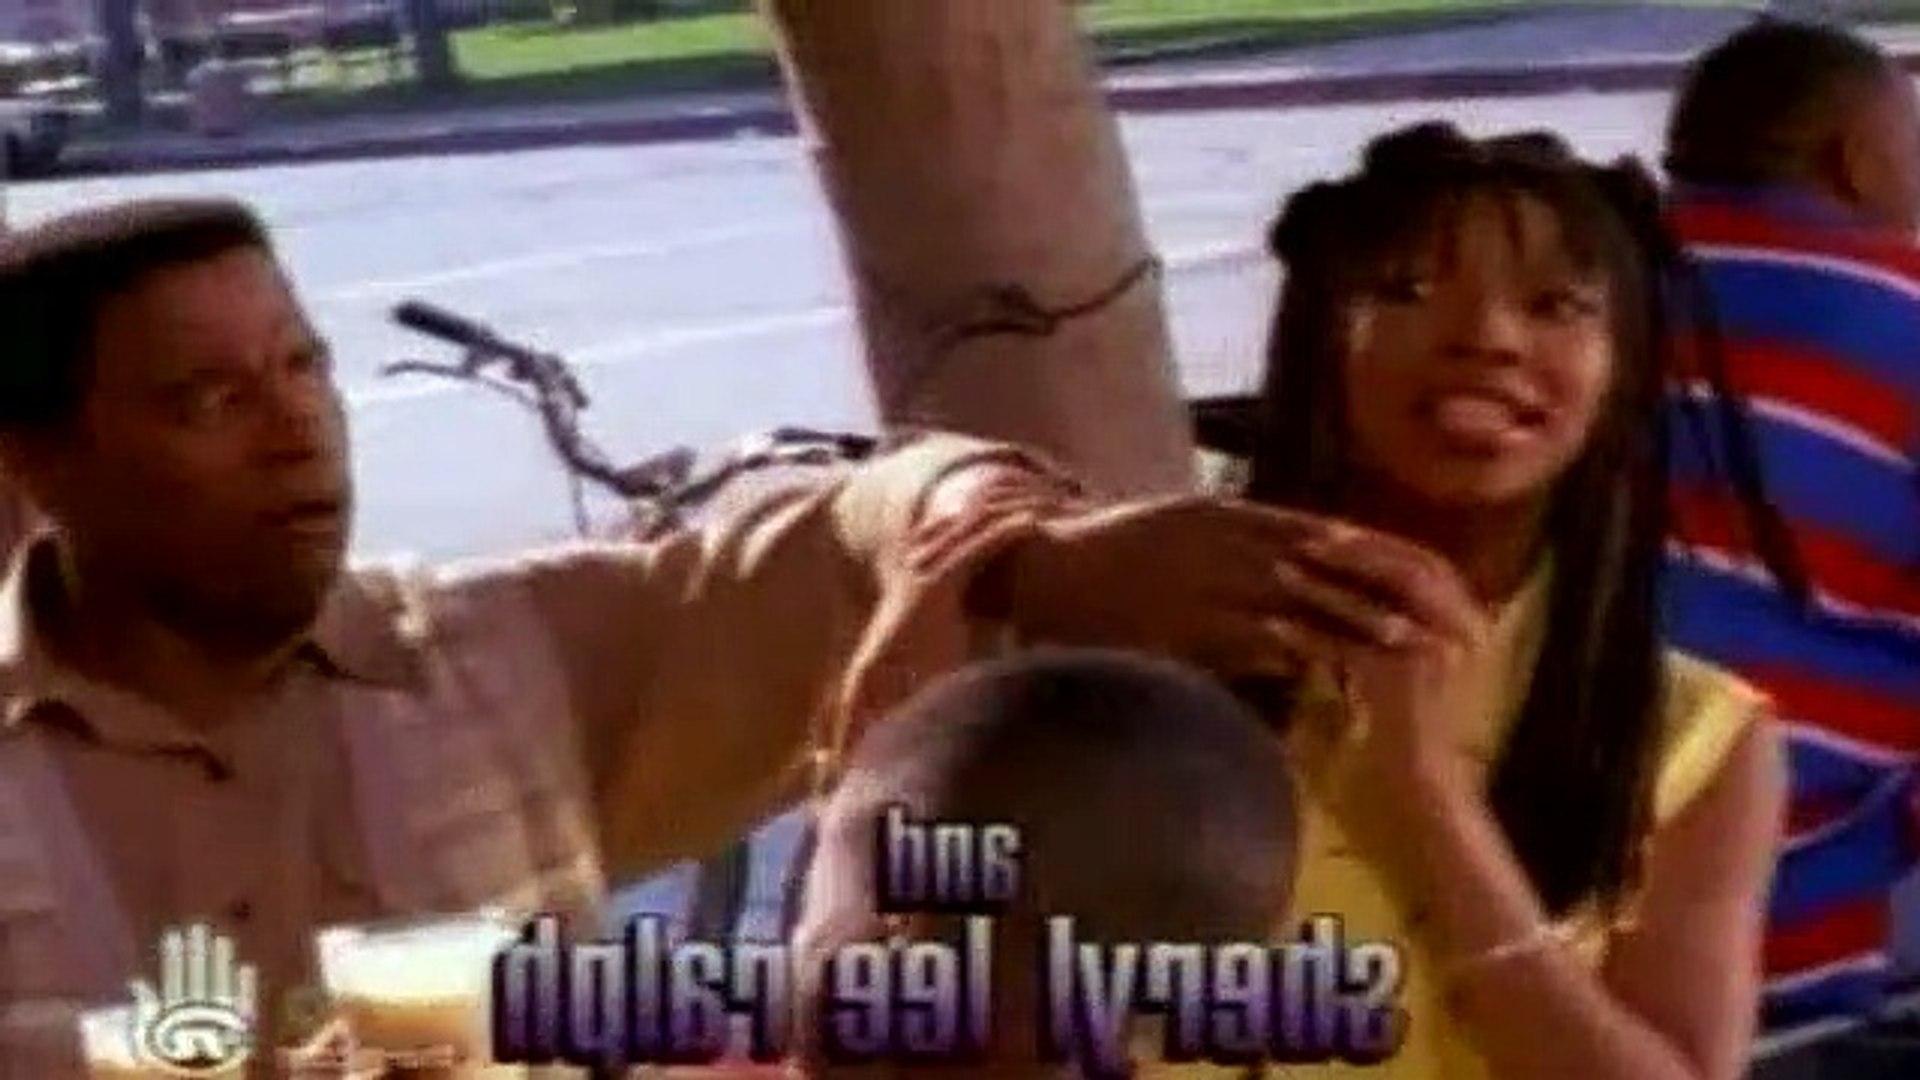 Moesha Season 2 Episode 20 Songs in the Key of Strife